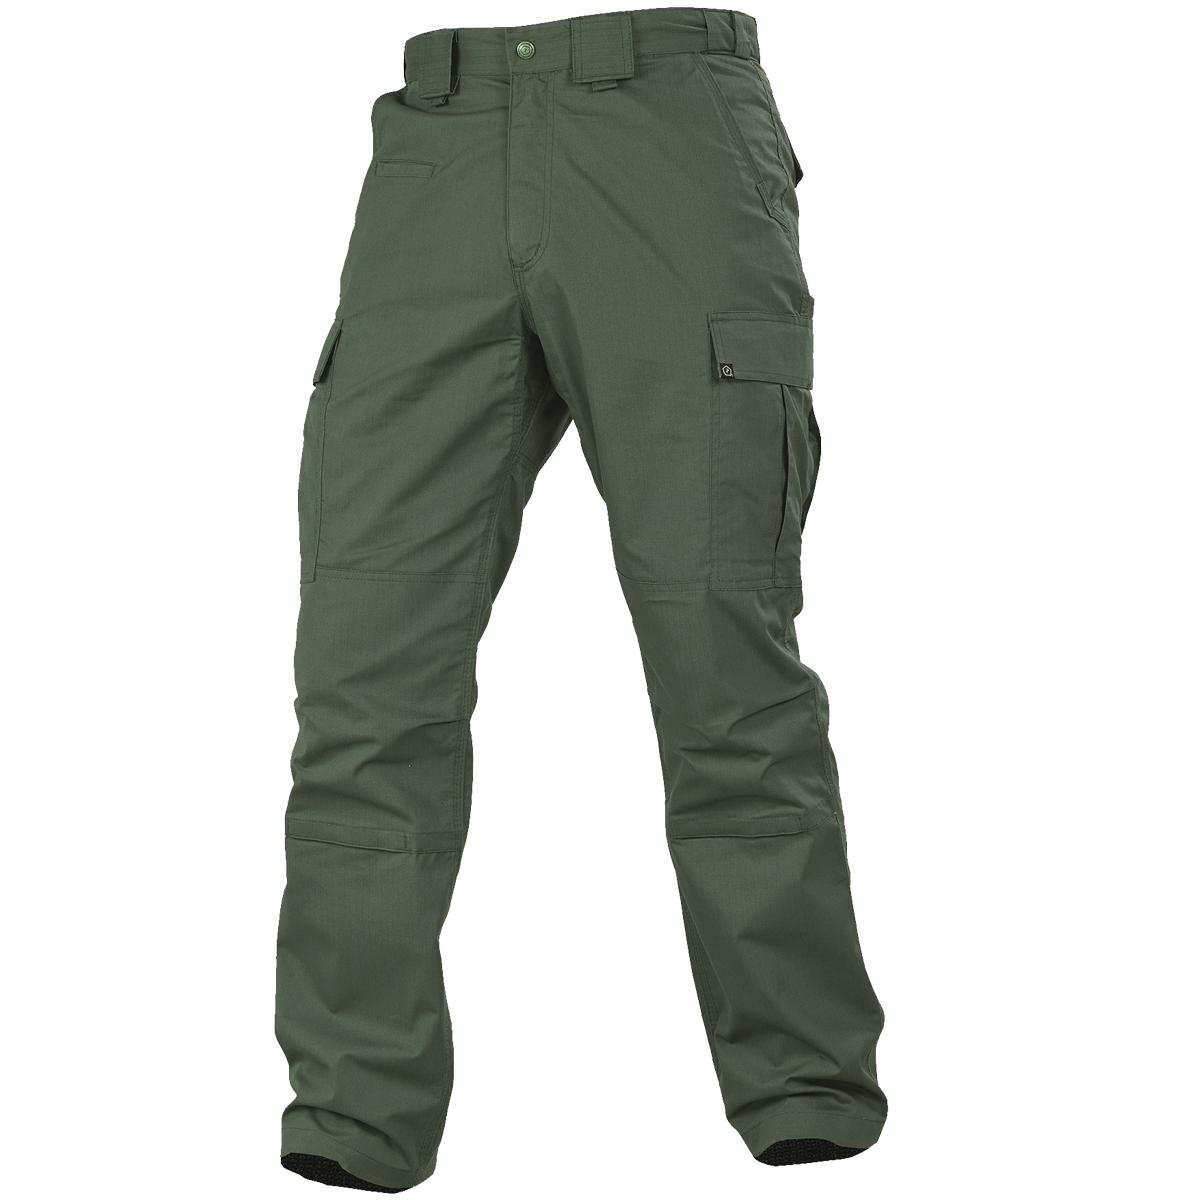 Pentagon T-BDU Pants Durable Mens Combat Hunting Trousers Work Army Camo Green